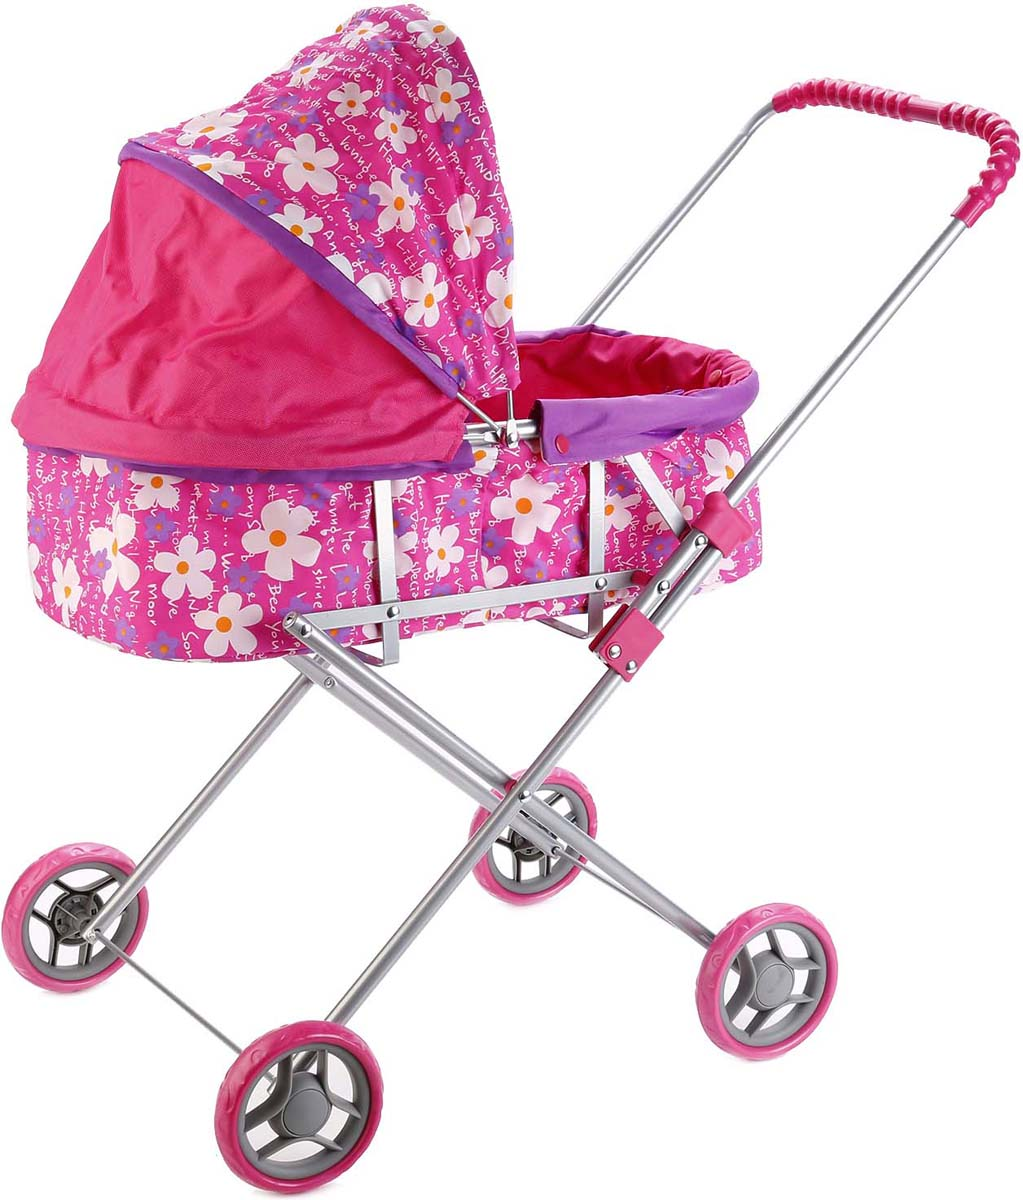 Карапуз Коляска-Трость для кукол 233503 карапуз коляска трость для кукол 63ac c2